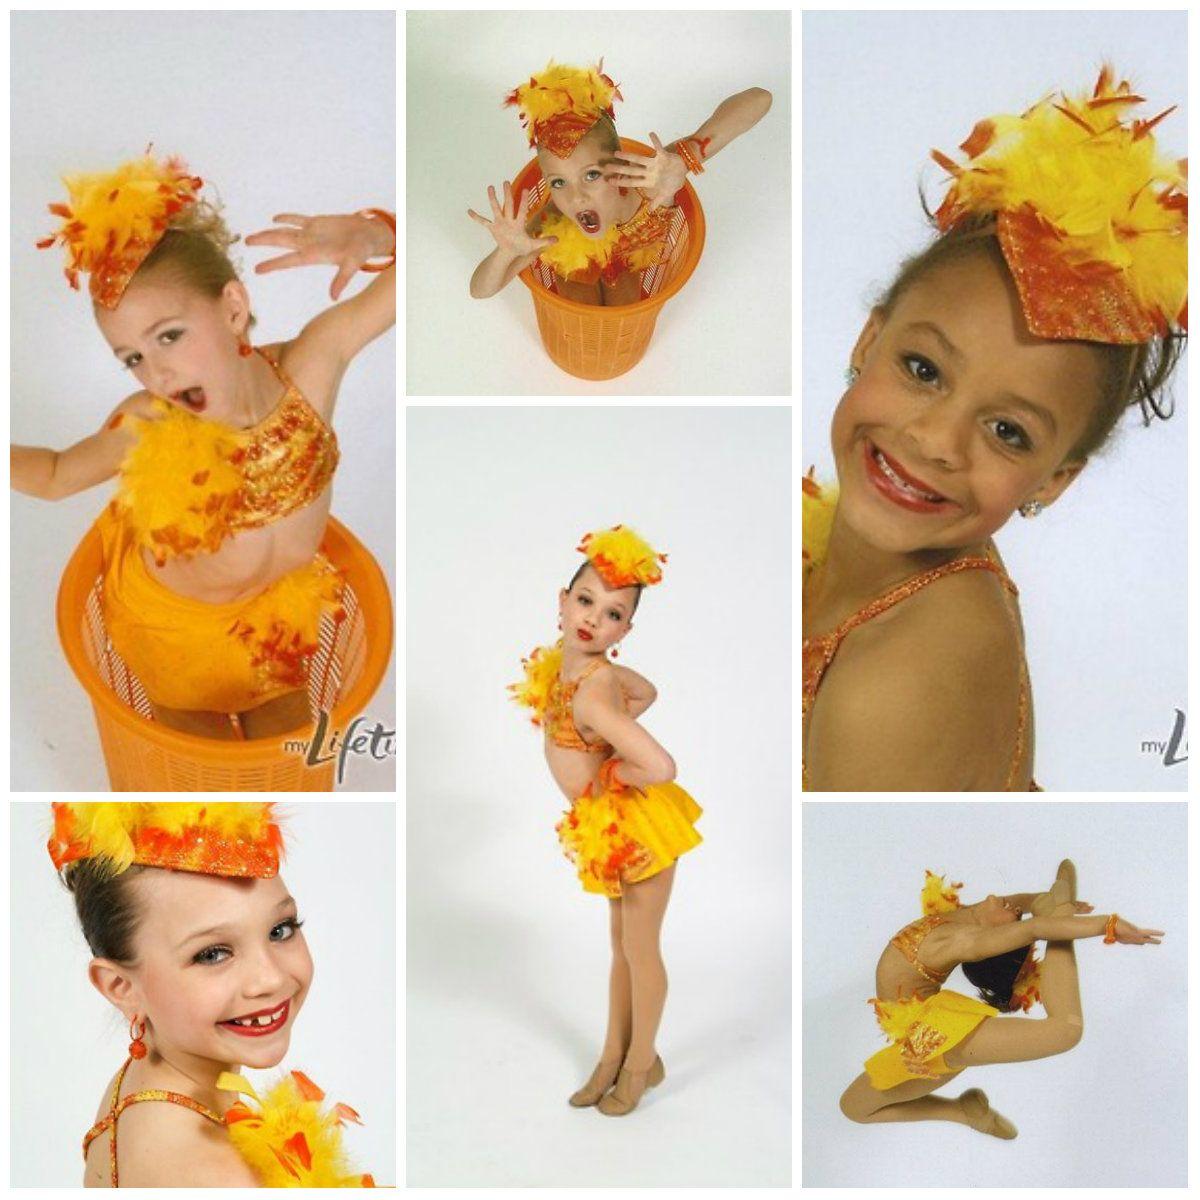 Our mini dancers